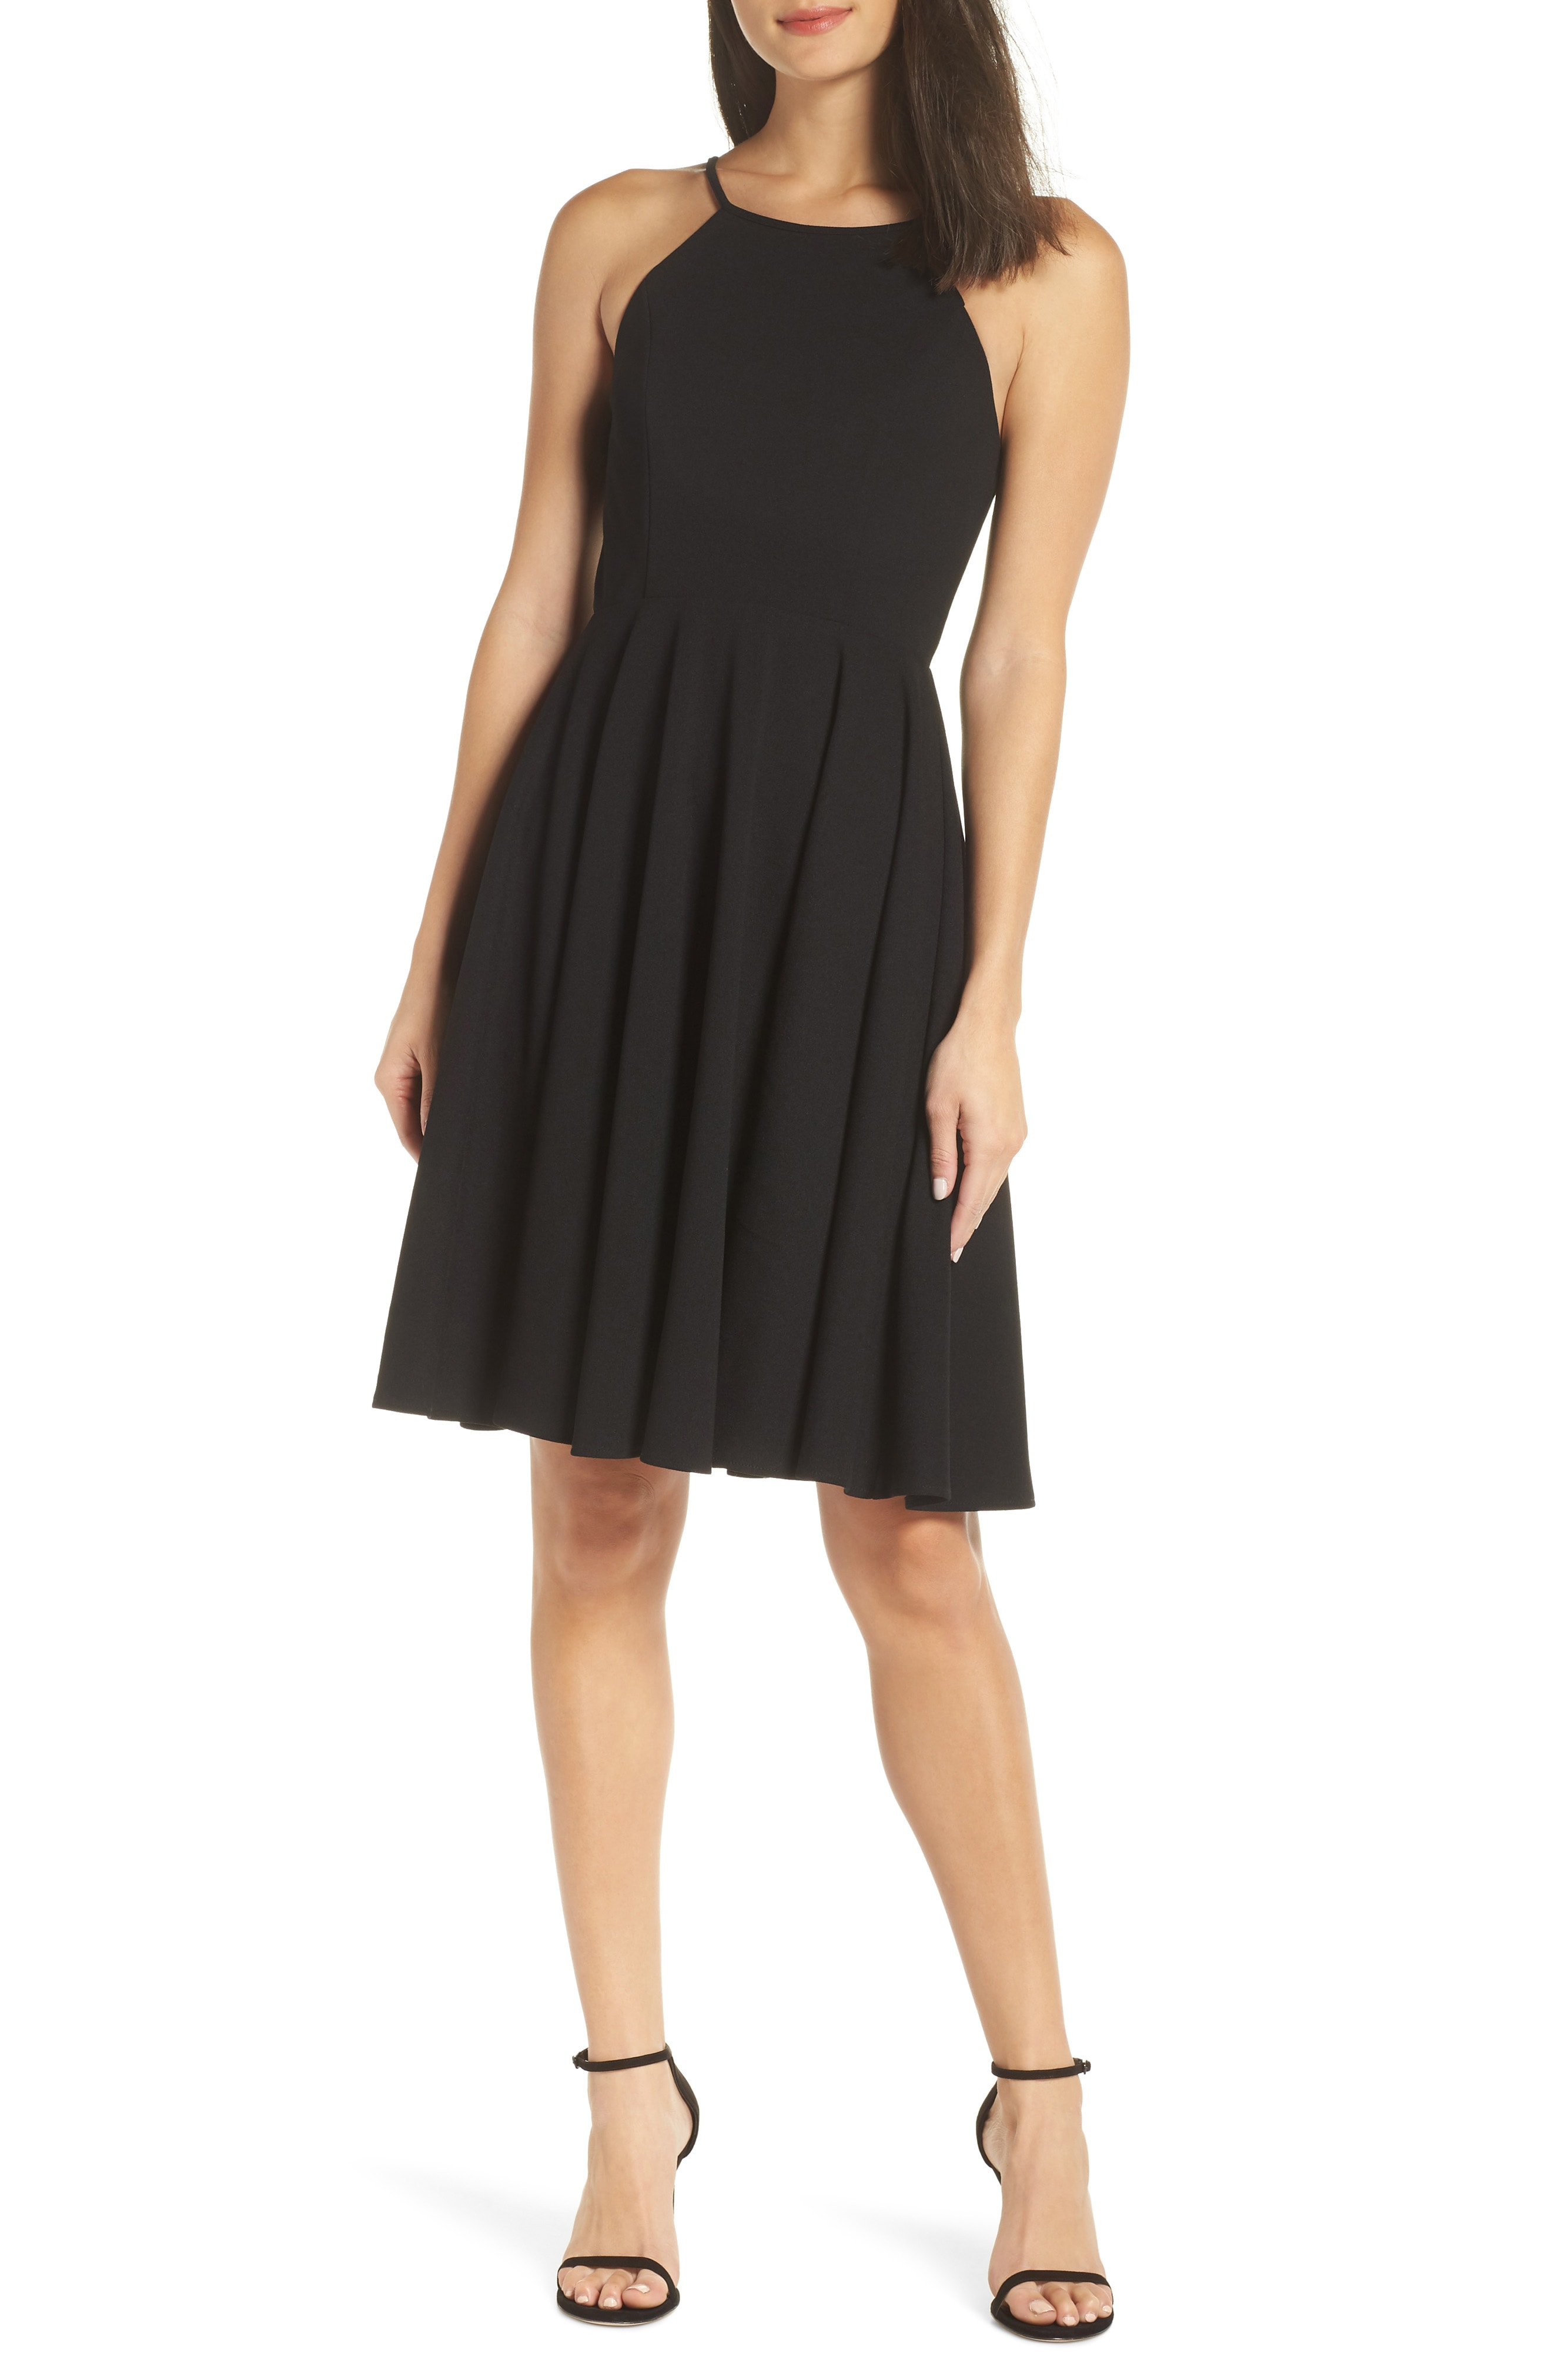 Lulus Halter Neck A-Line Cocktail Dress